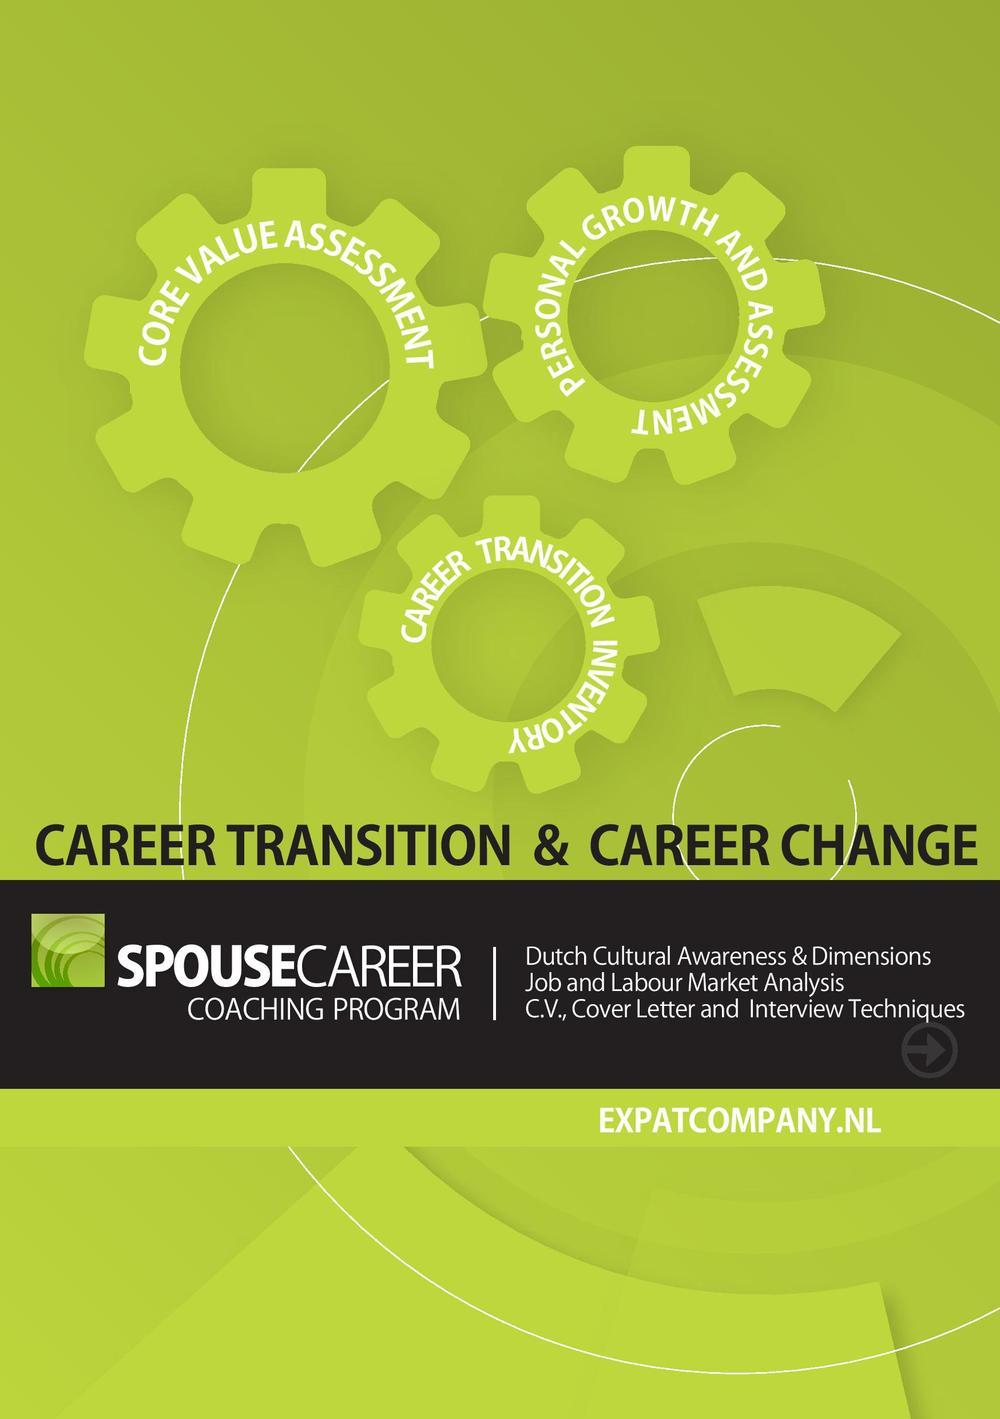 Career_transition_career_change_web-page-001.jpg